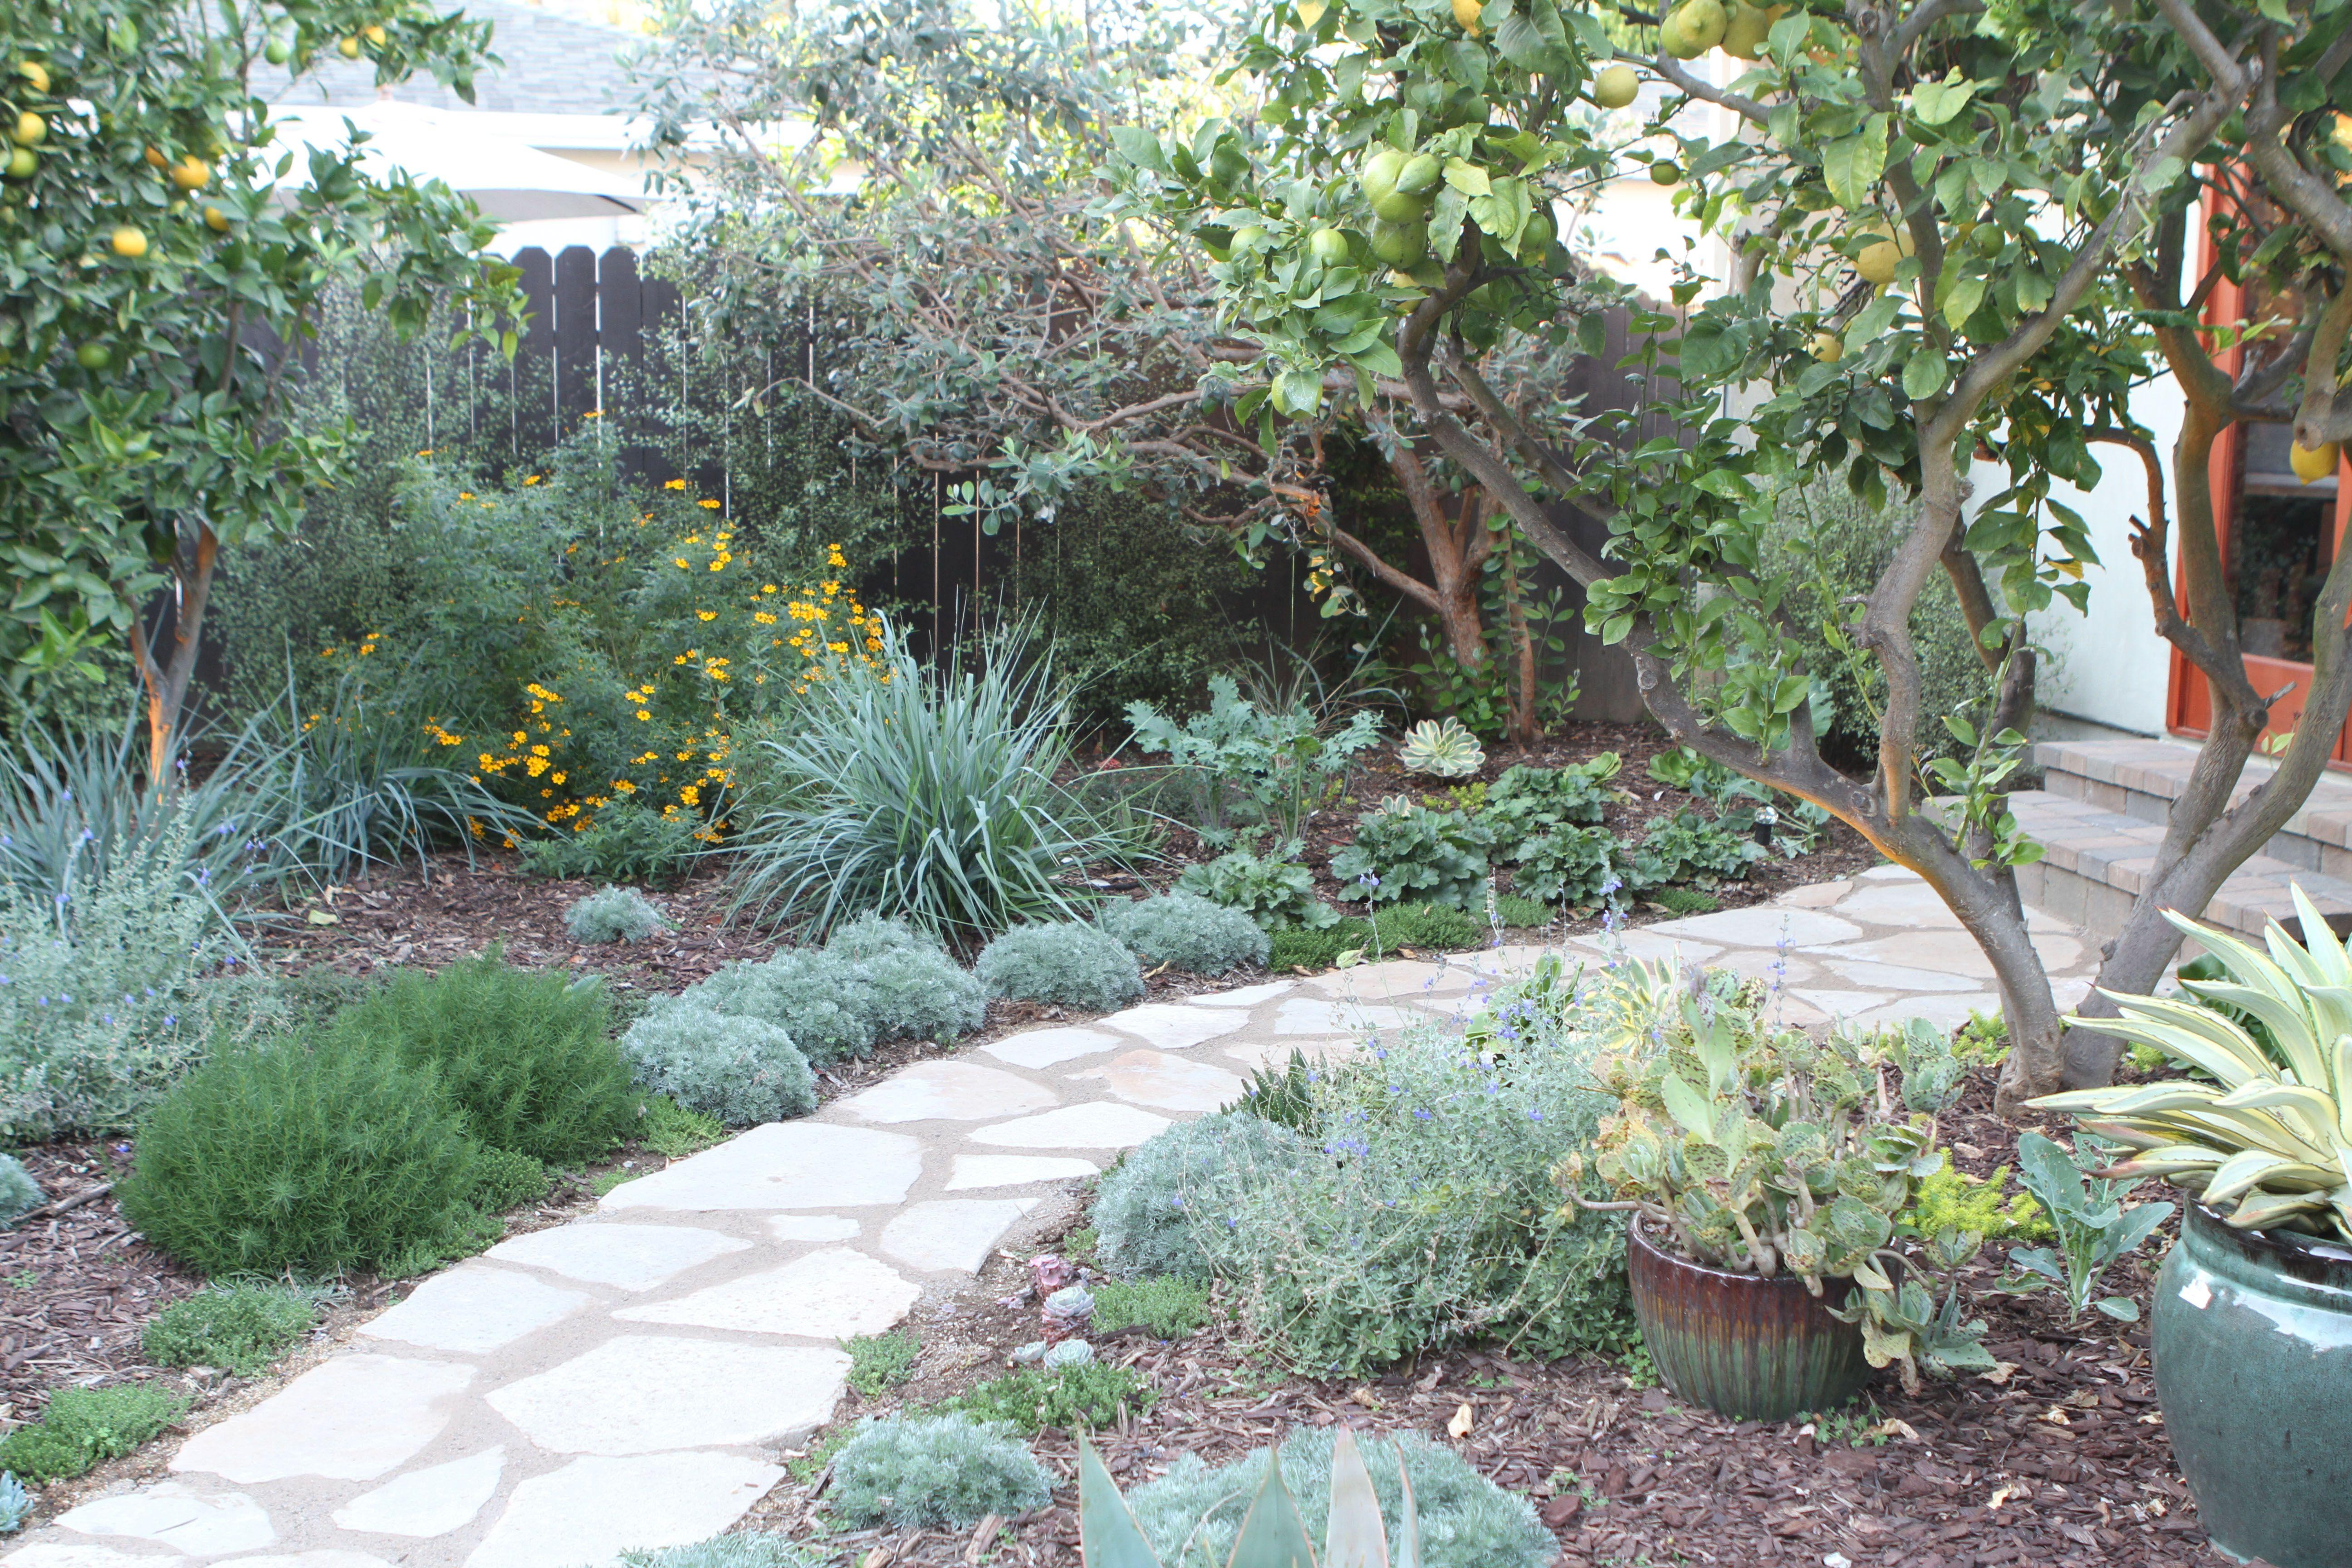 Pin By Arleen Ferrara Of Satori Desig On Satori Design Projects Garden Design Landscape Design Backyard Ideas For Small Yards